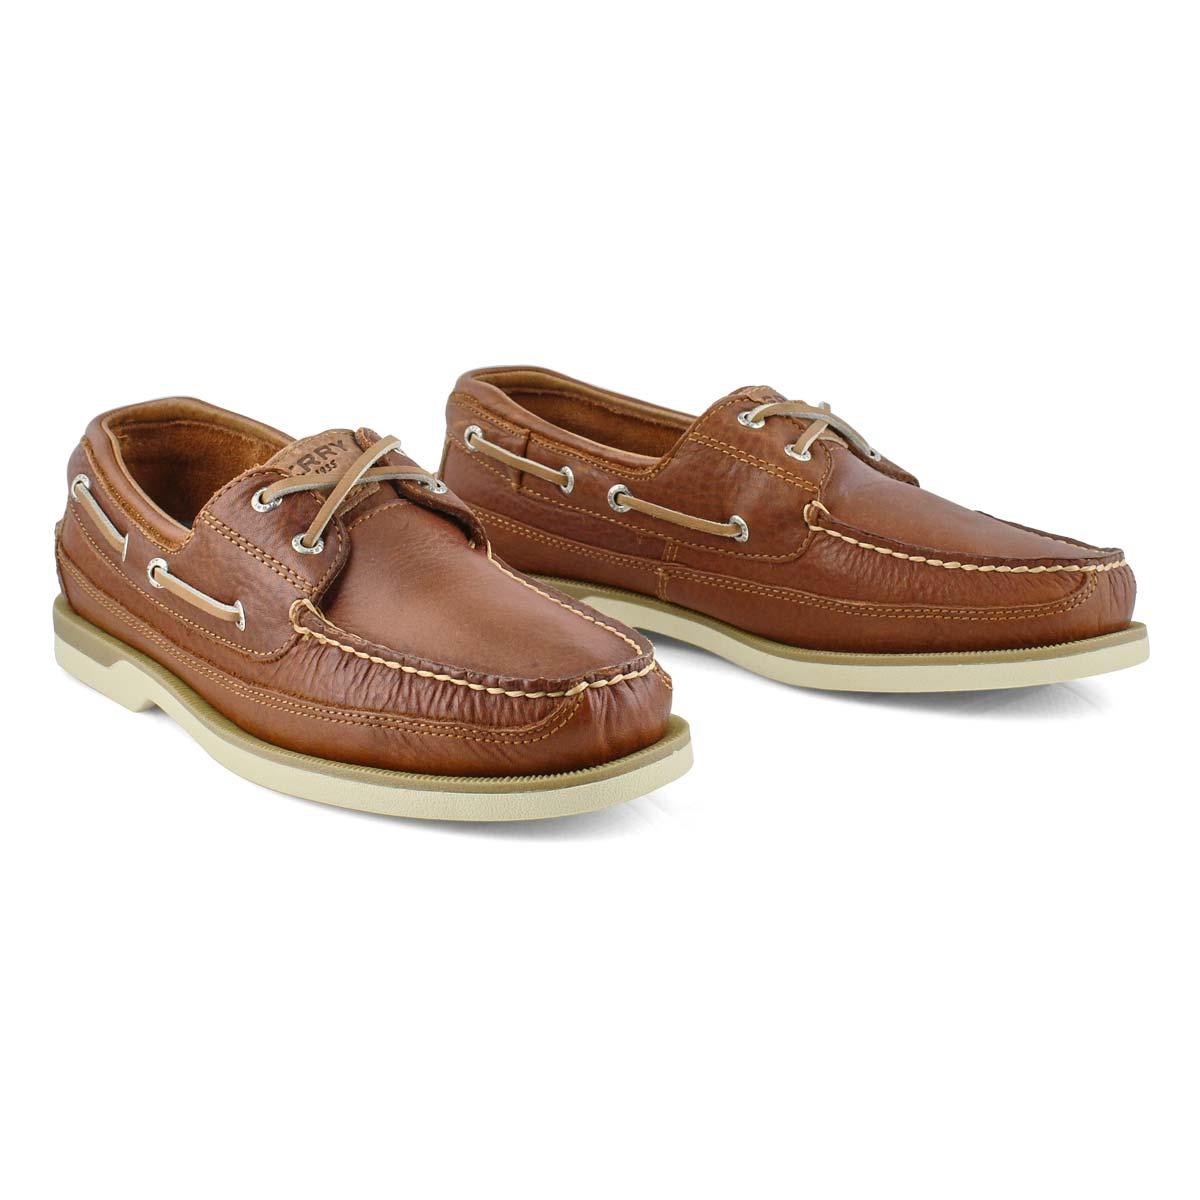 Men's Mako Canoe Moc Boat Shoe - Tan